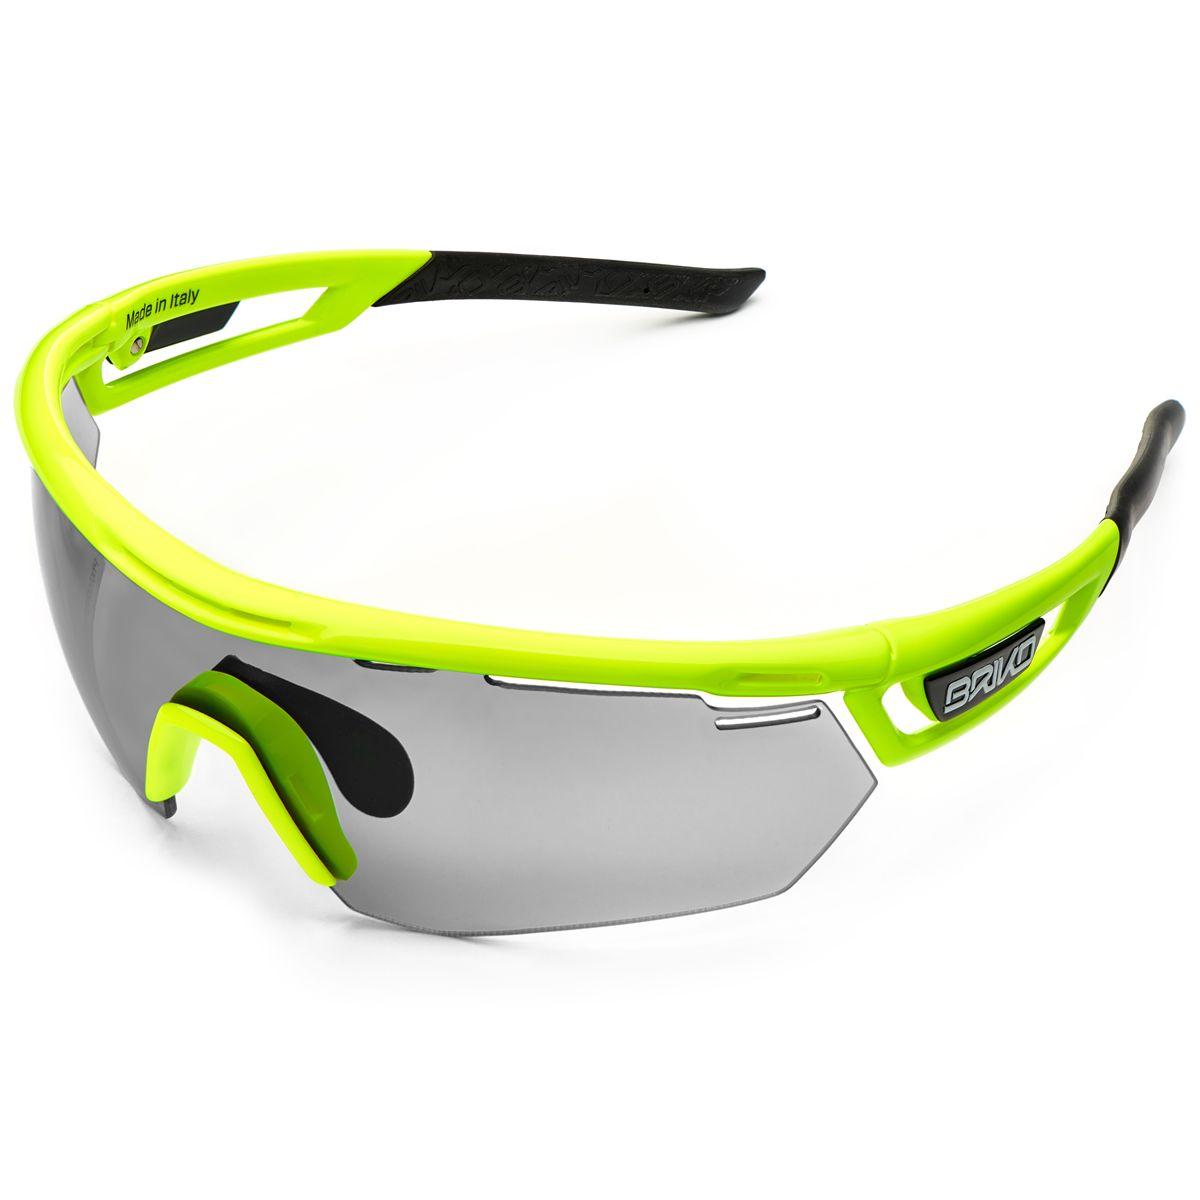 7881705e5 Slnečné okuliare BRIKO CYCLOPE PHOTO, fluo yellow | kubicasport.eu